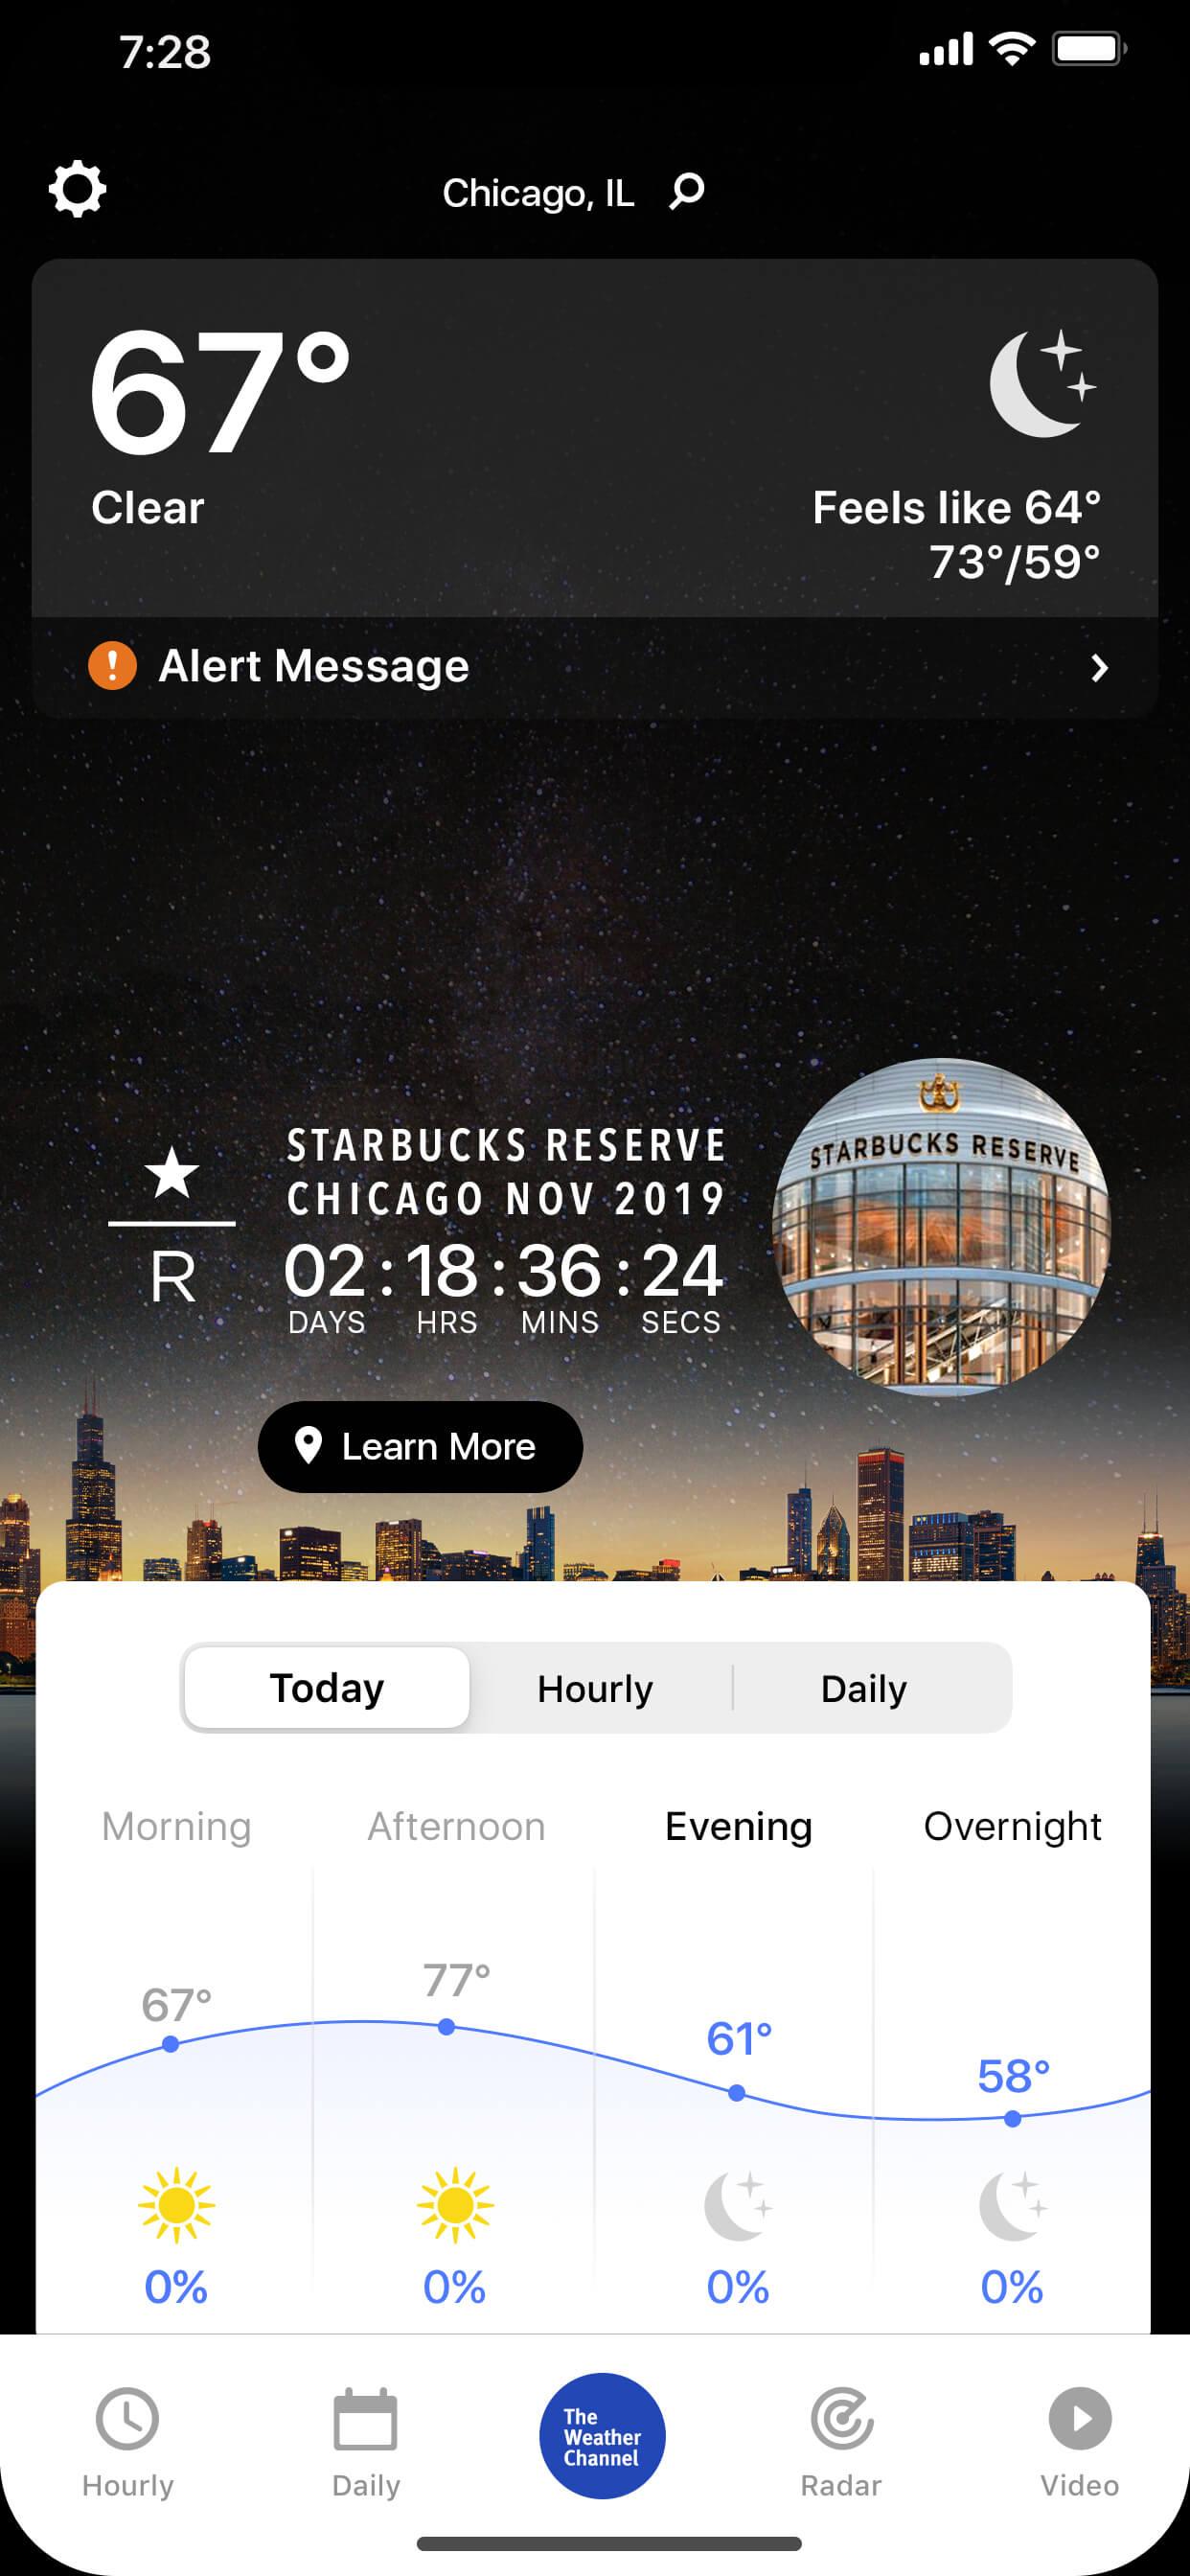 Starbucks_Mobile_App-IM_NextGen-Mock_ChiGPS_Chicago clear_night